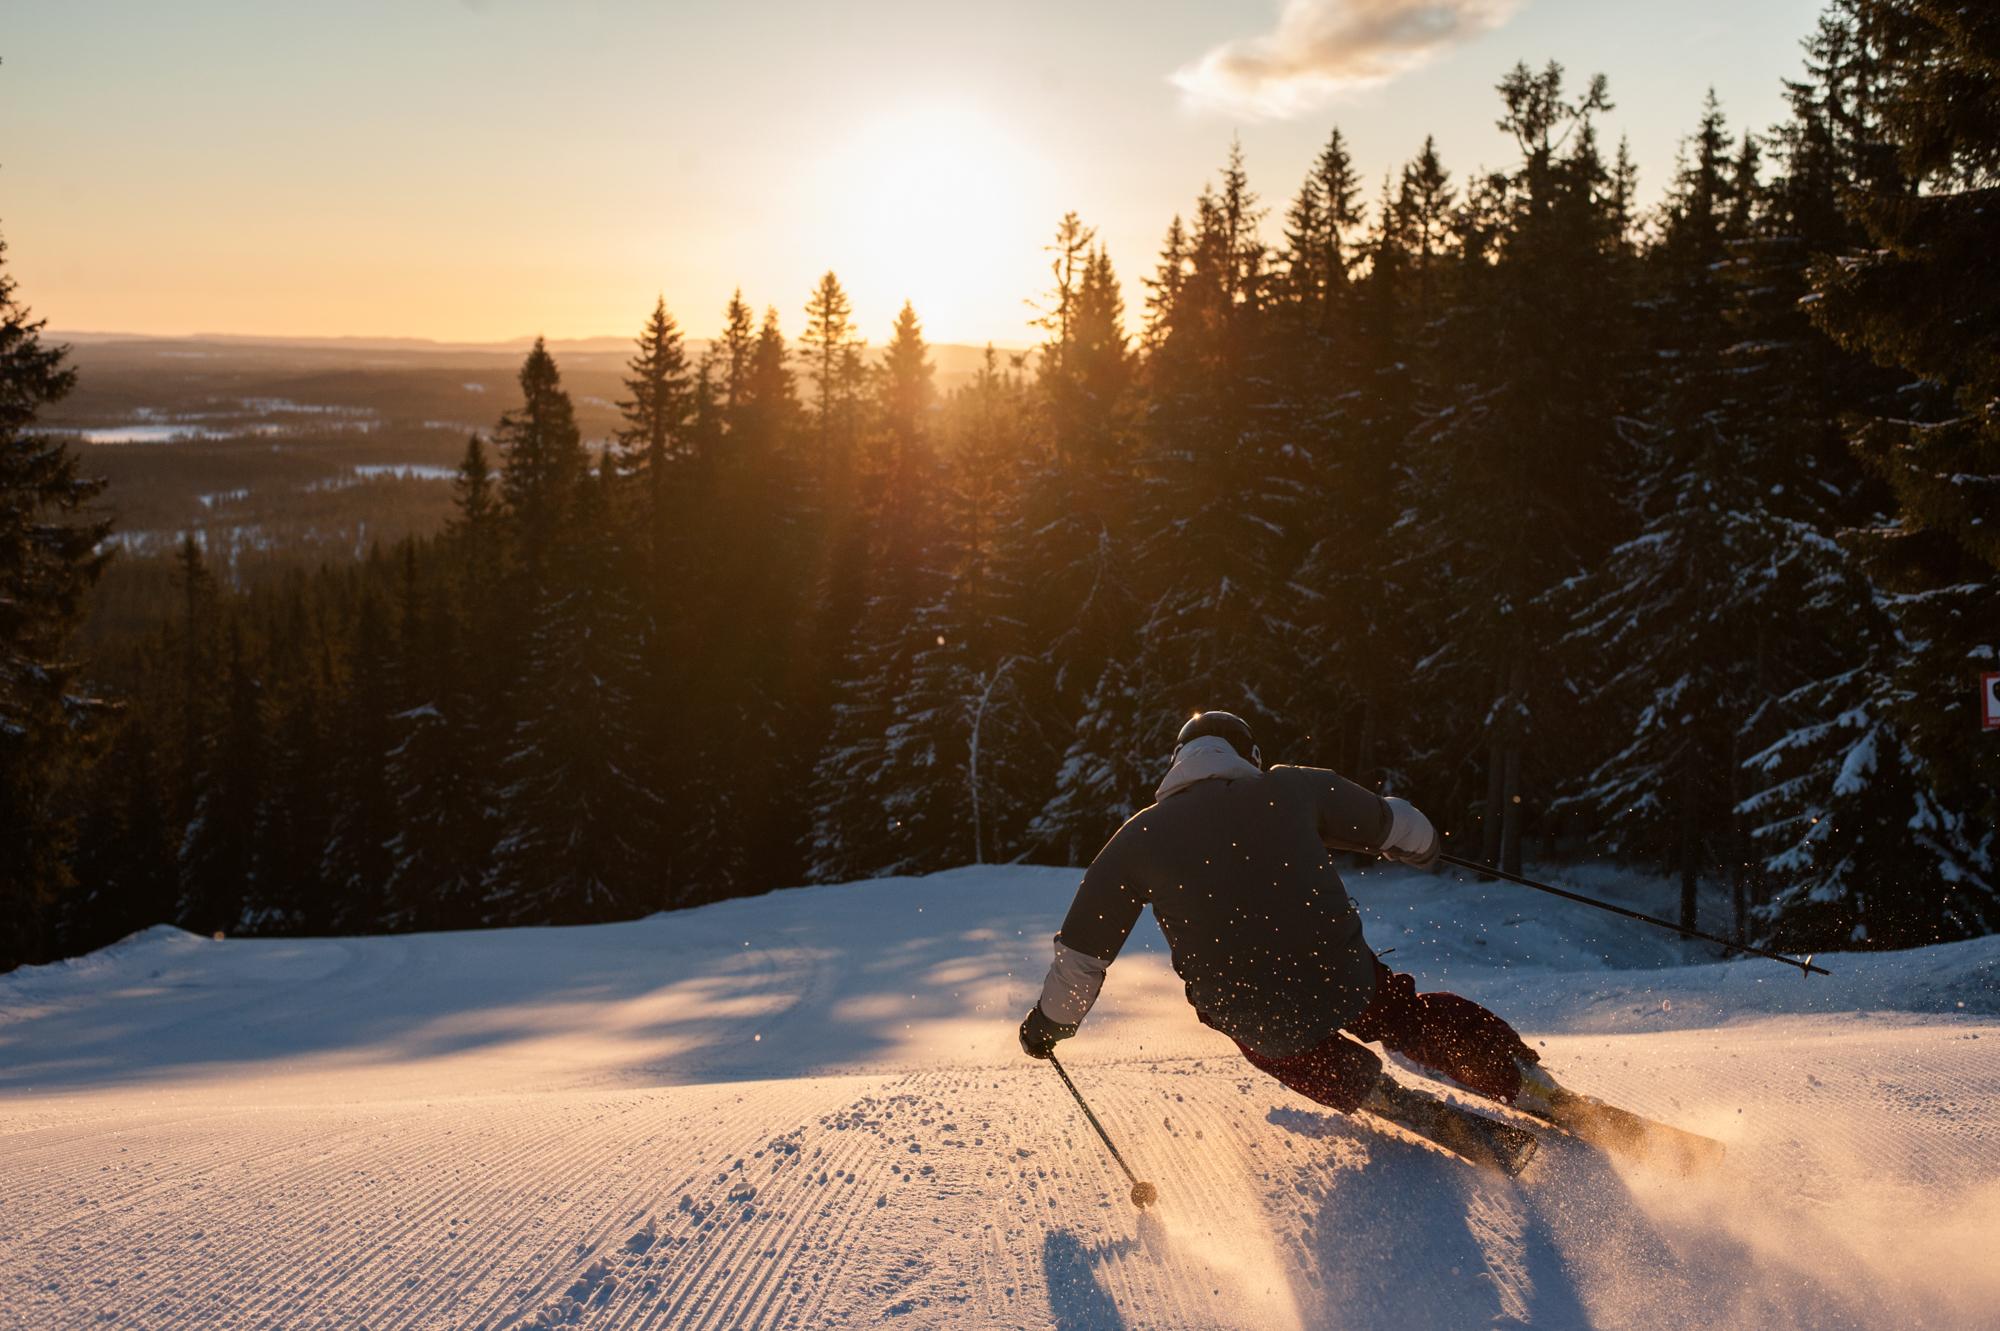 Sverige Abner Lufthavn Midt I Sneen Trendsandtravel Dk